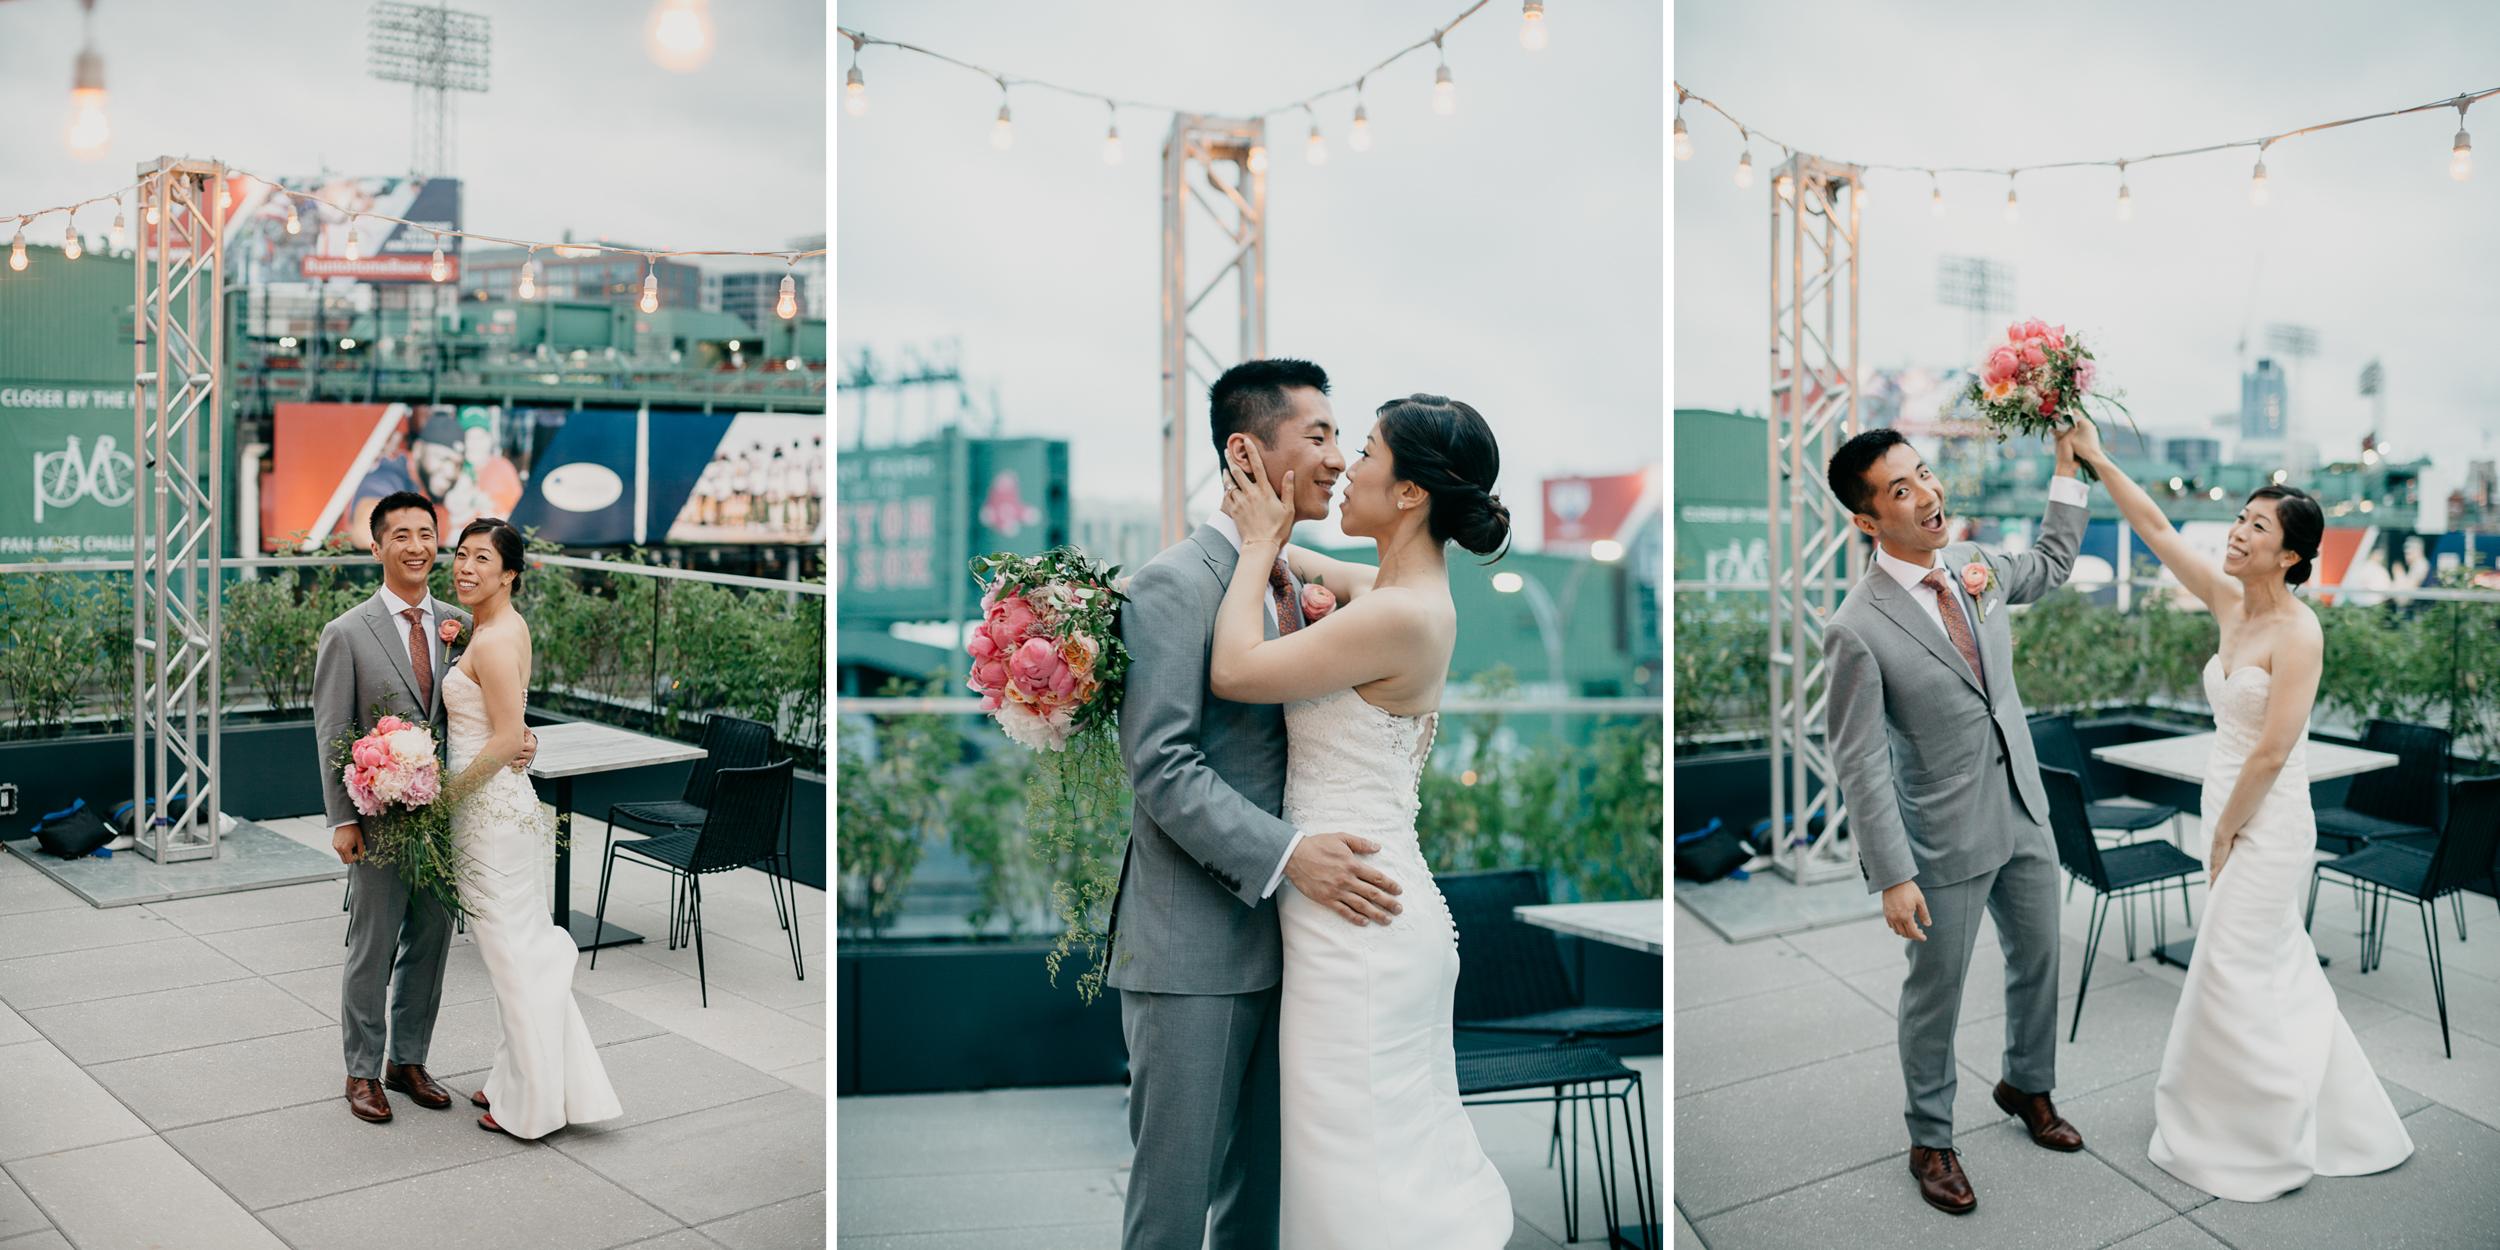 Mindy_Bo_Boston_Wedding_MIT_HotelCommonwealth_029.jpg